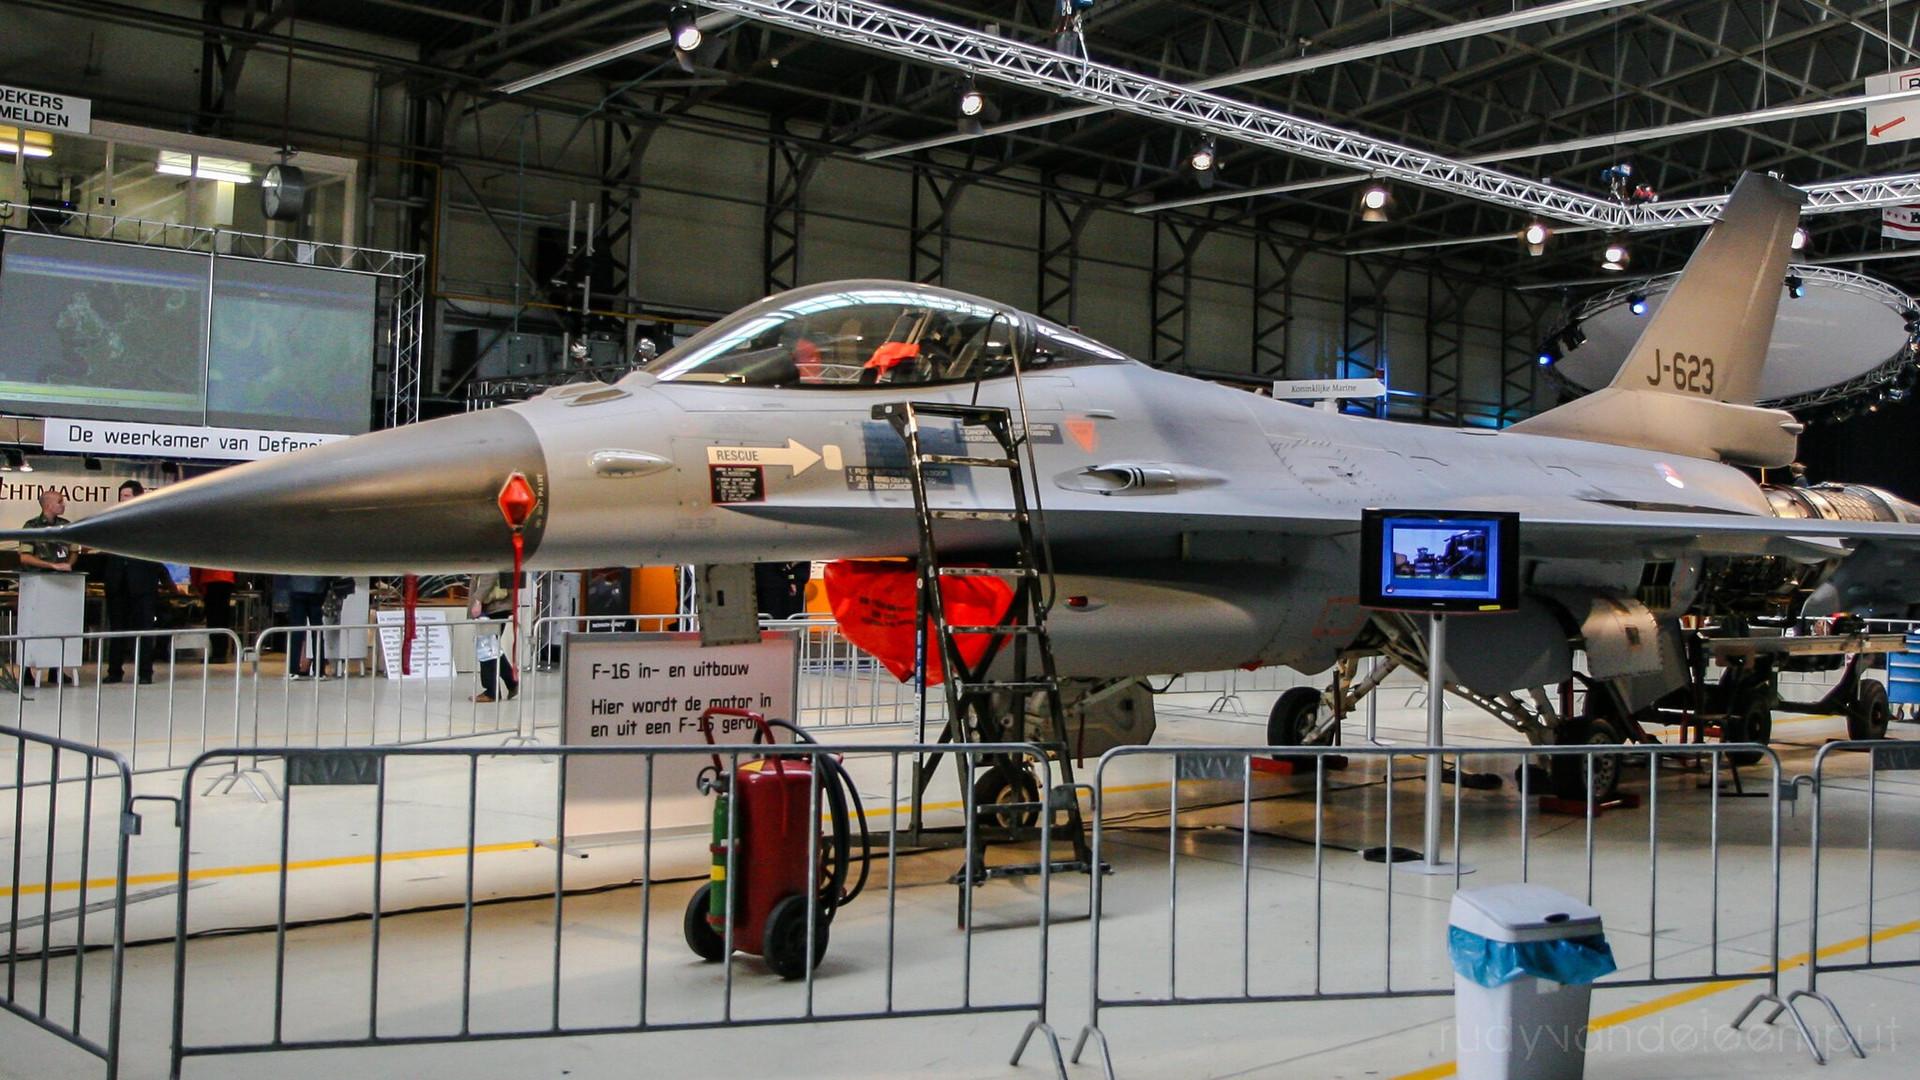 J-623   Build: 1982 - Lockheed Martin F-16 A Fighting Falcon